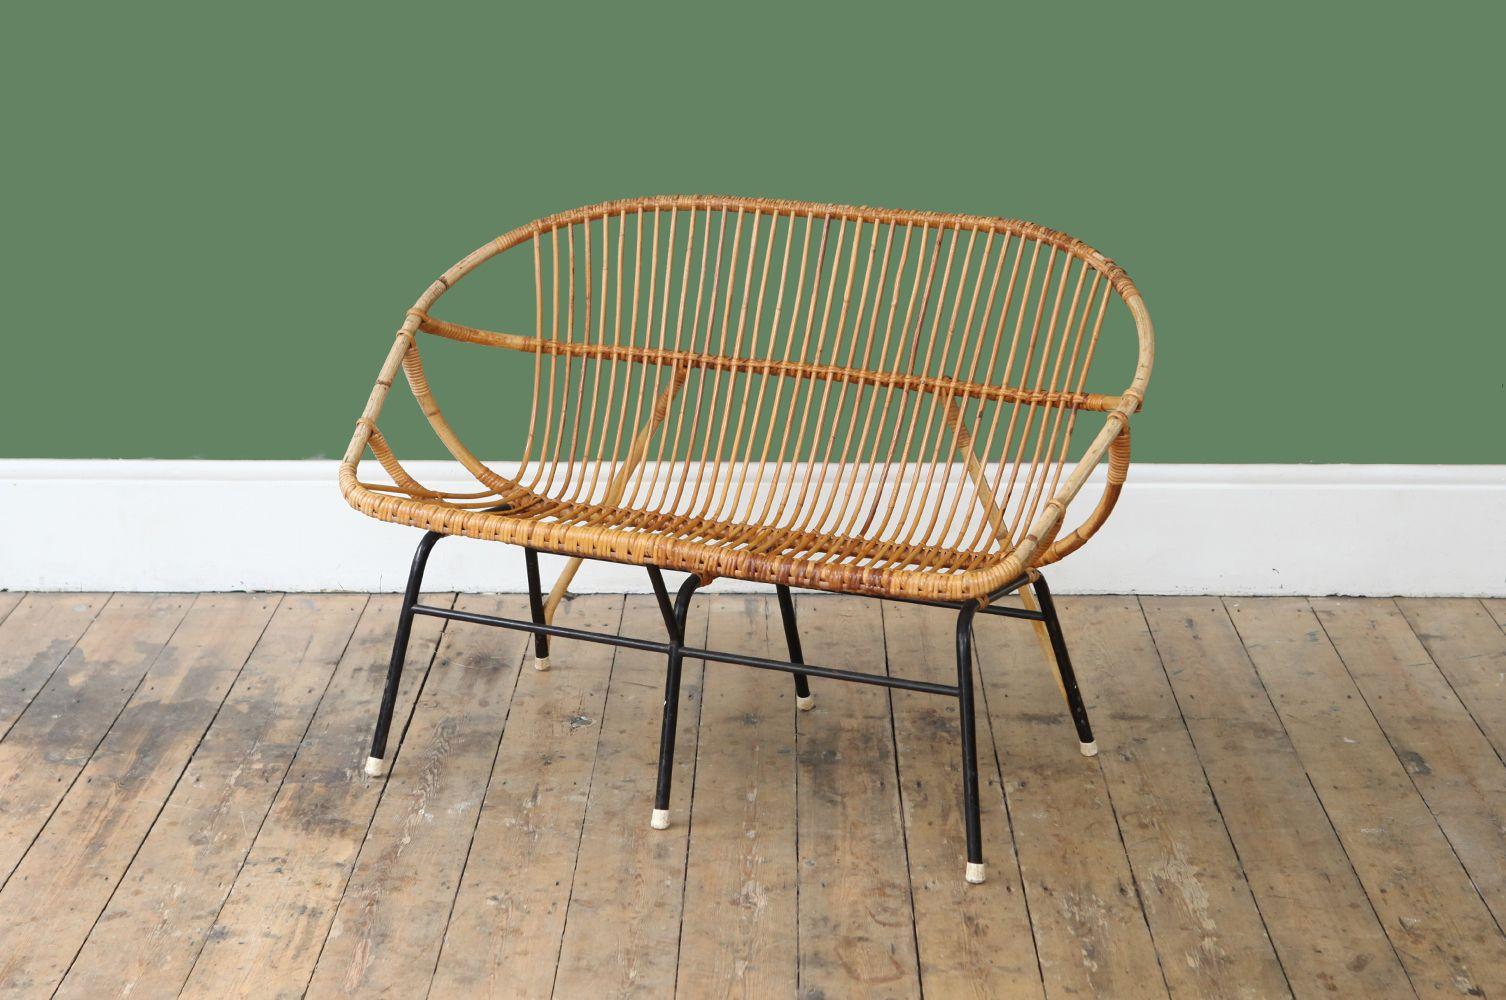 canap 2 places vintage en rotin bambou de roh noordwolde en vente sur pamono. Black Bedroom Furniture Sets. Home Design Ideas